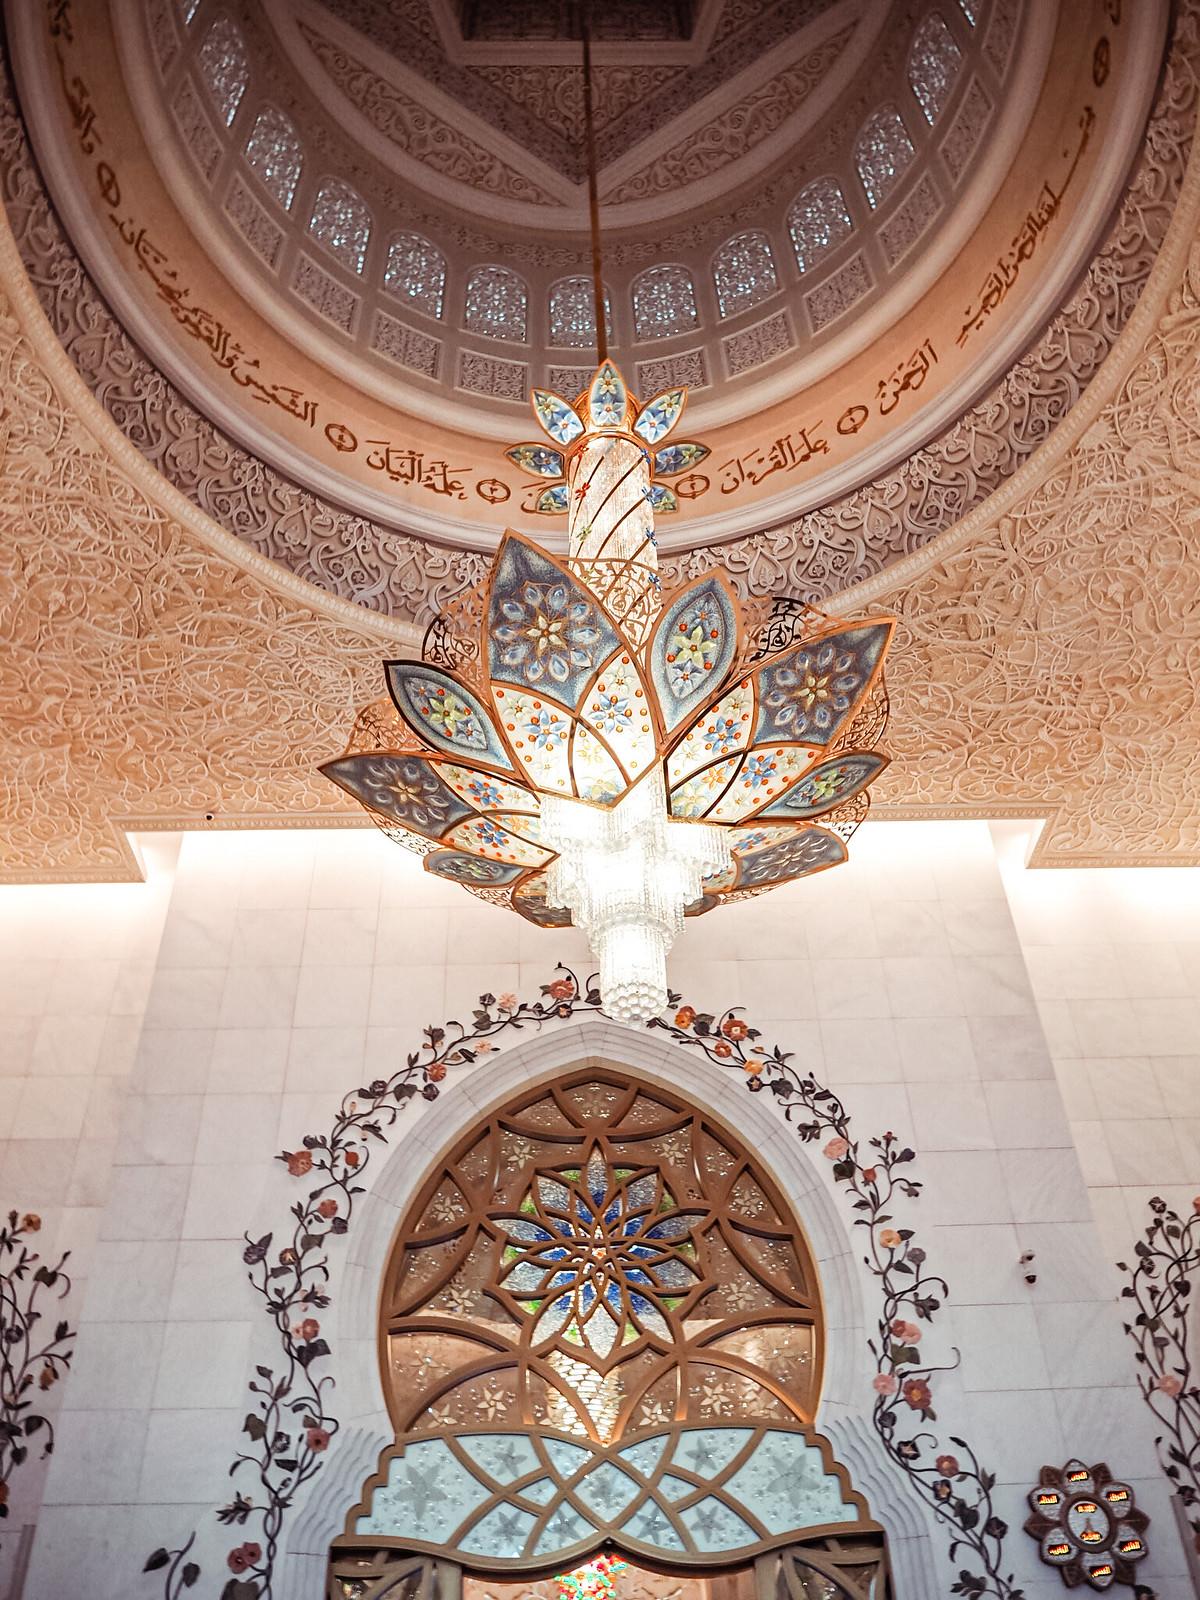 Sheikh Zayed Mosque inside